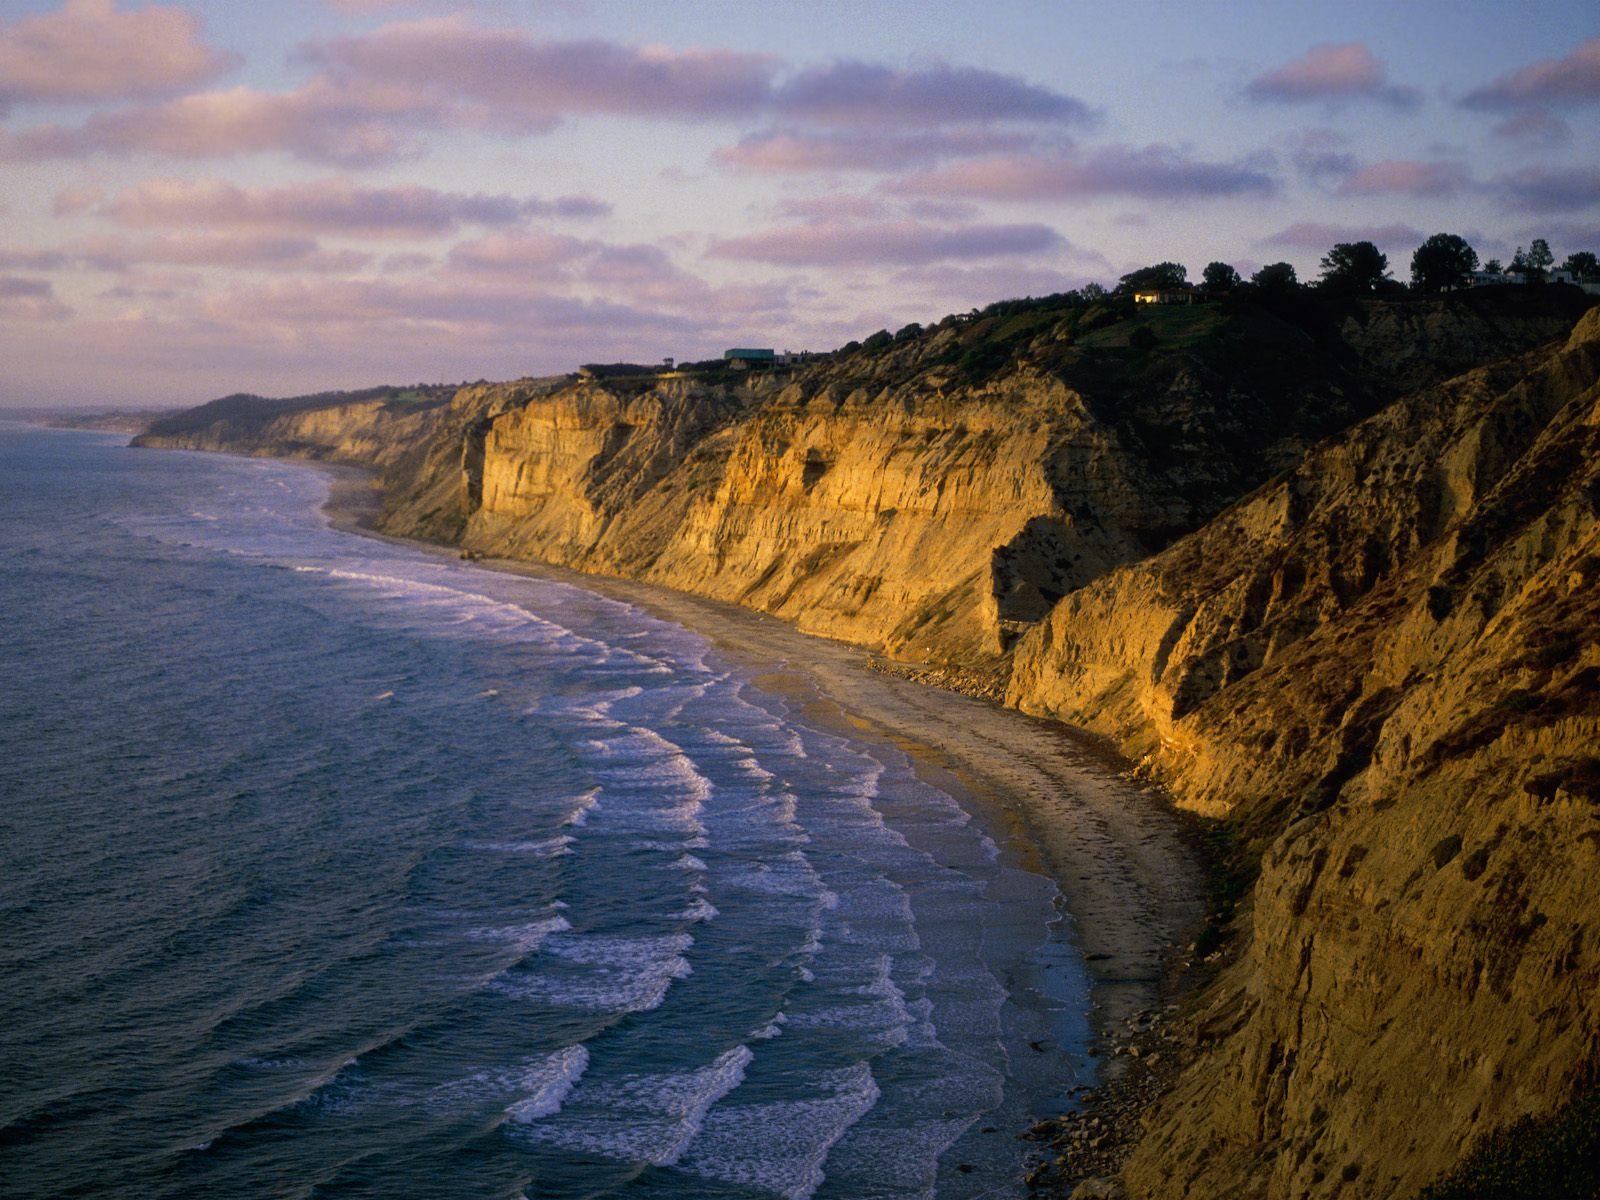 La Jolla Torrey Pines San Diego California 1600x1200